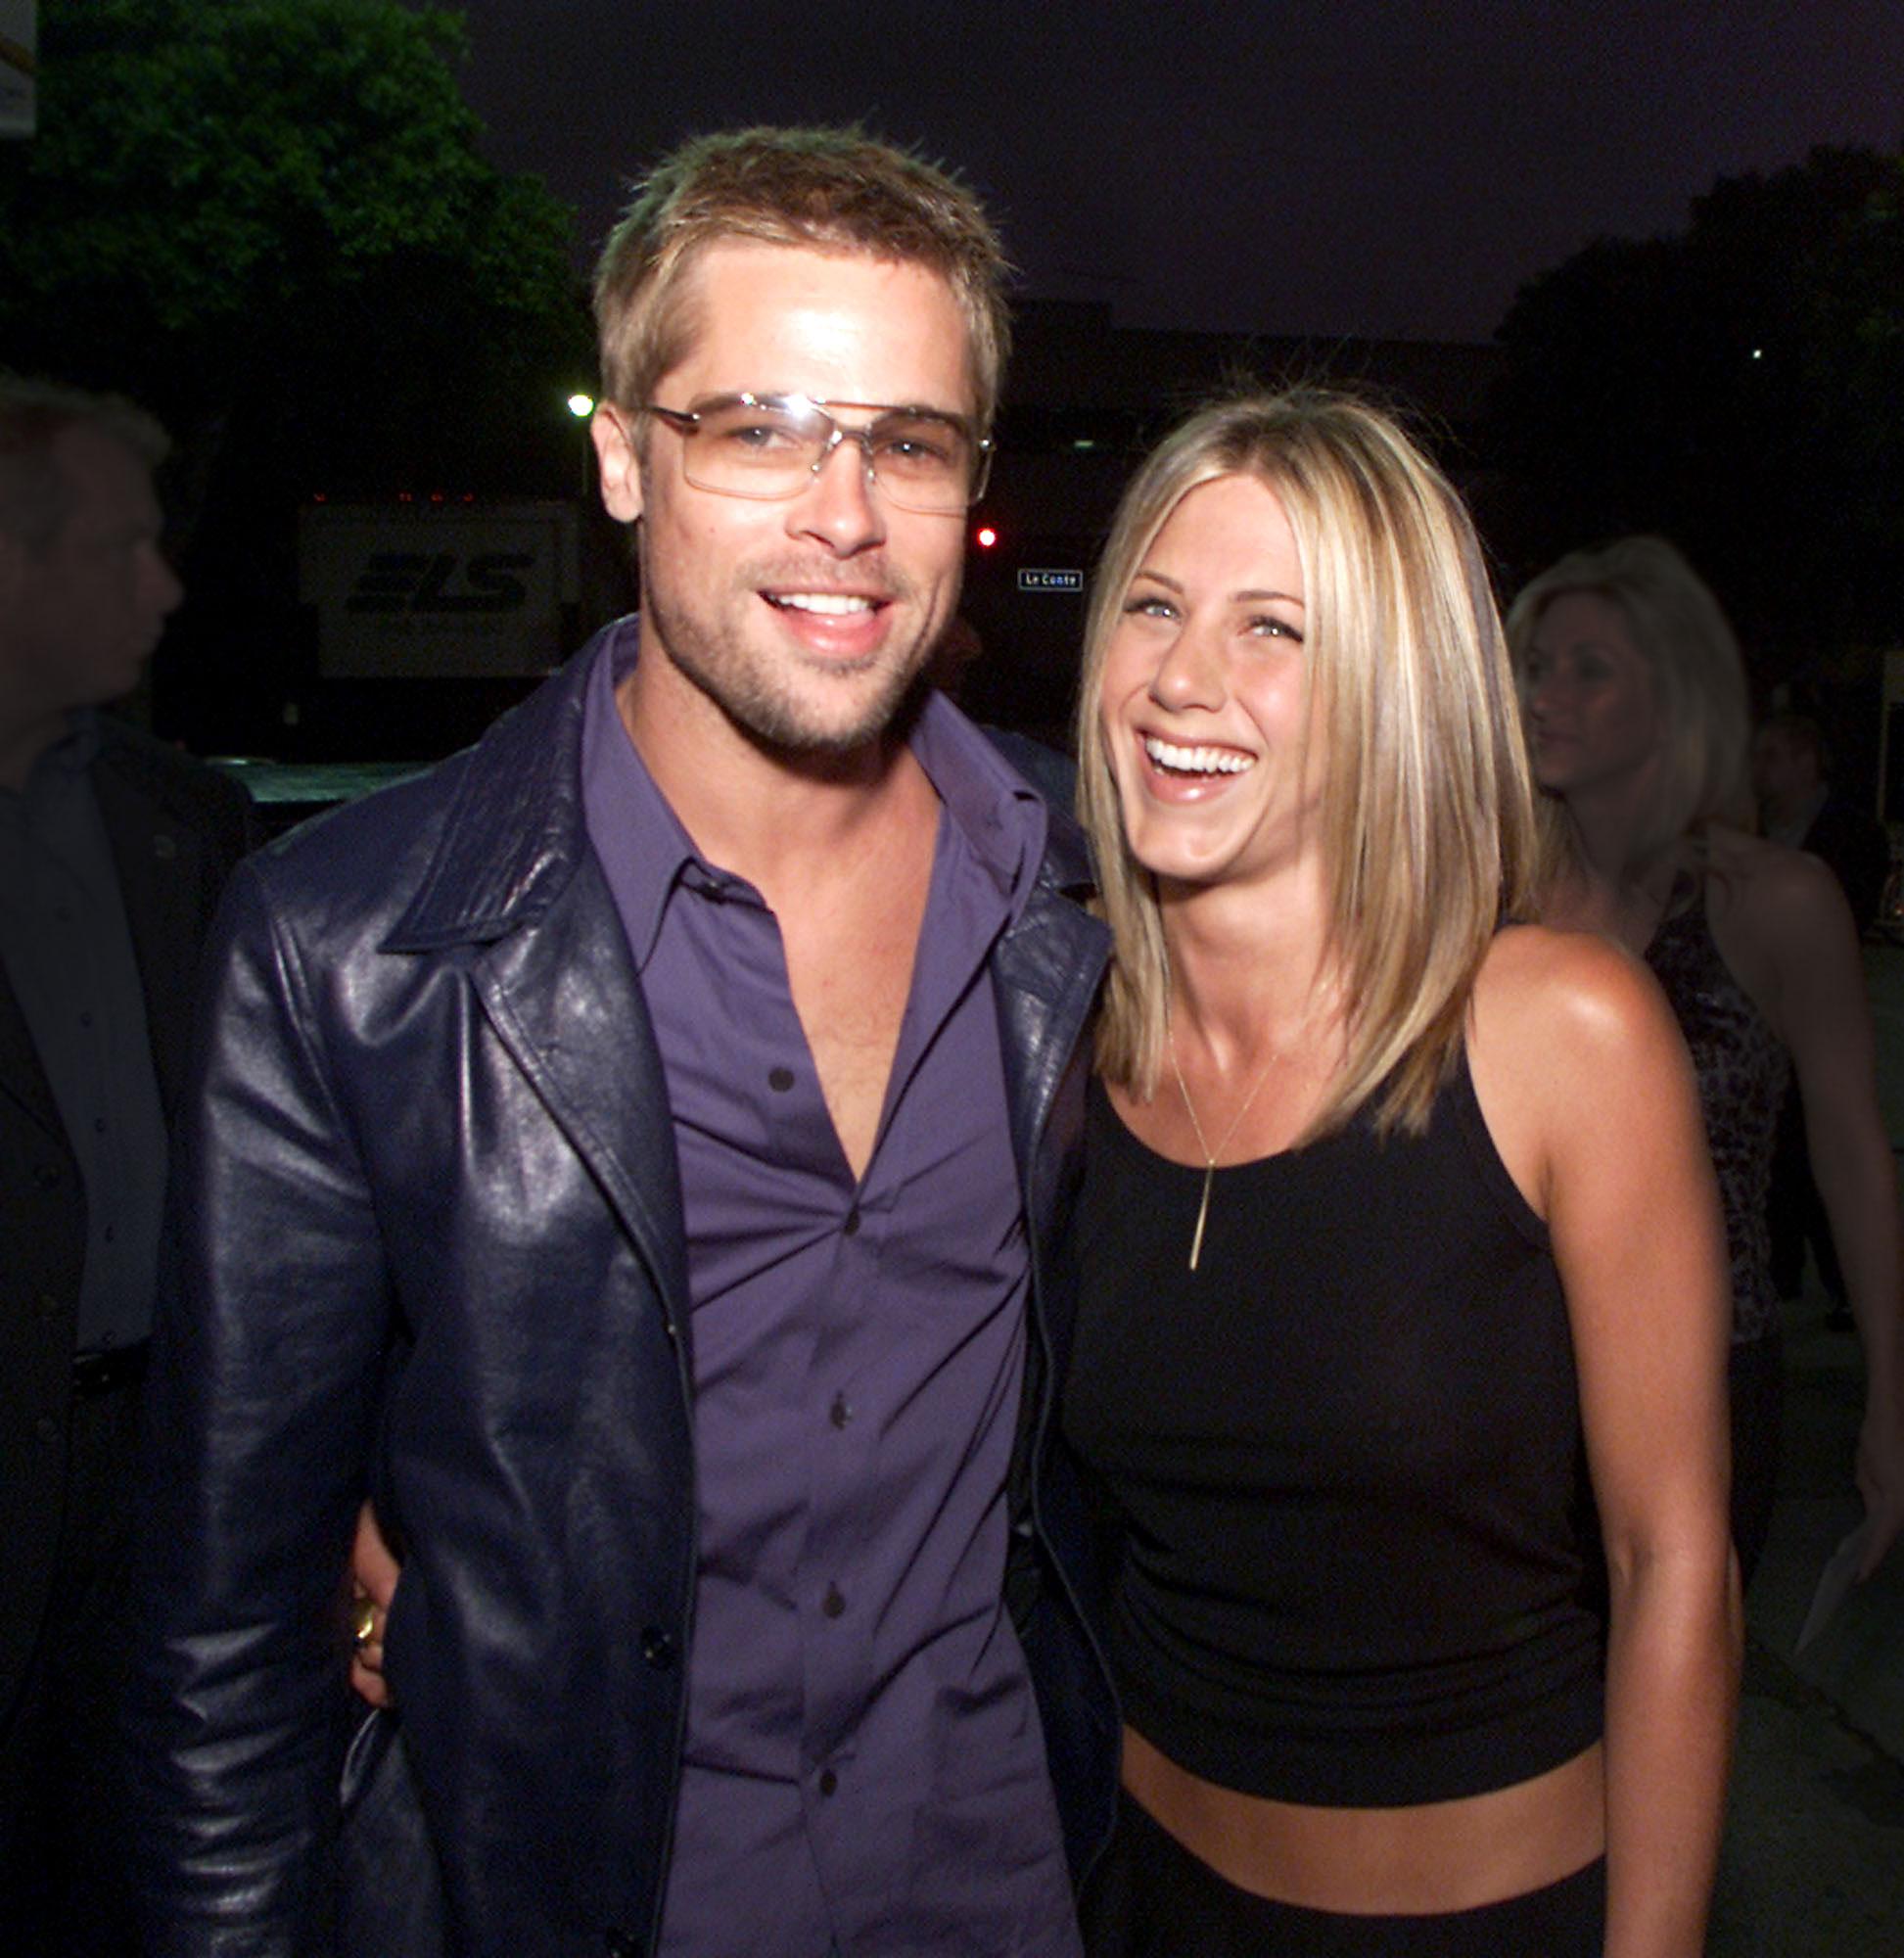 Brad Pitt and Jennifer Aniston Relationship Timeline - Brad Pitt, Jennifer Aniston